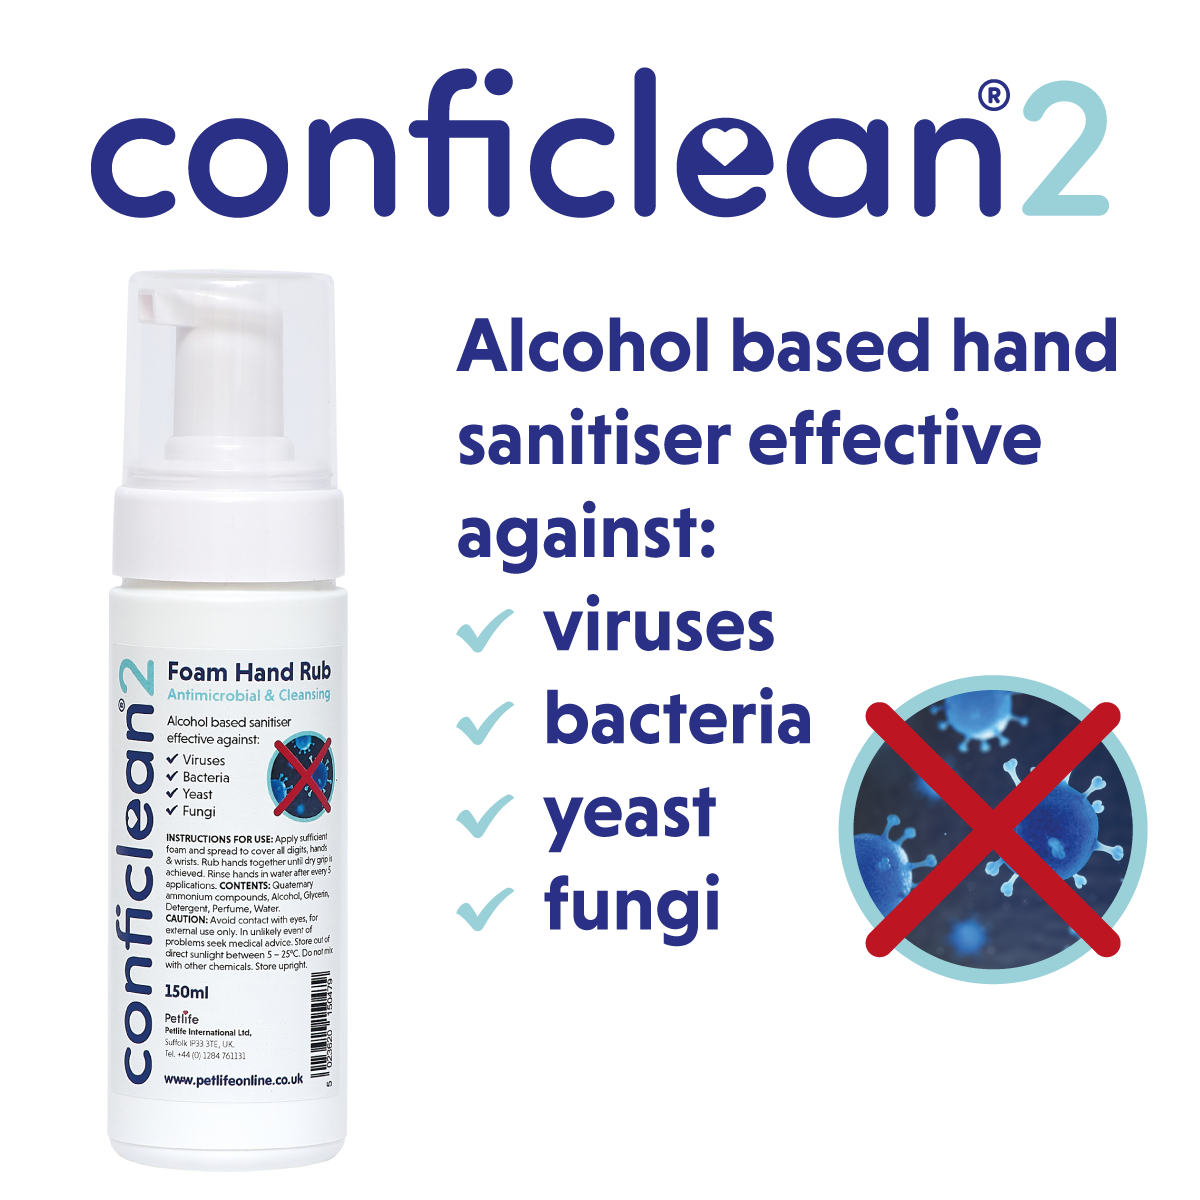 Conficlean2 Foam Hand Rub 150ml x 1